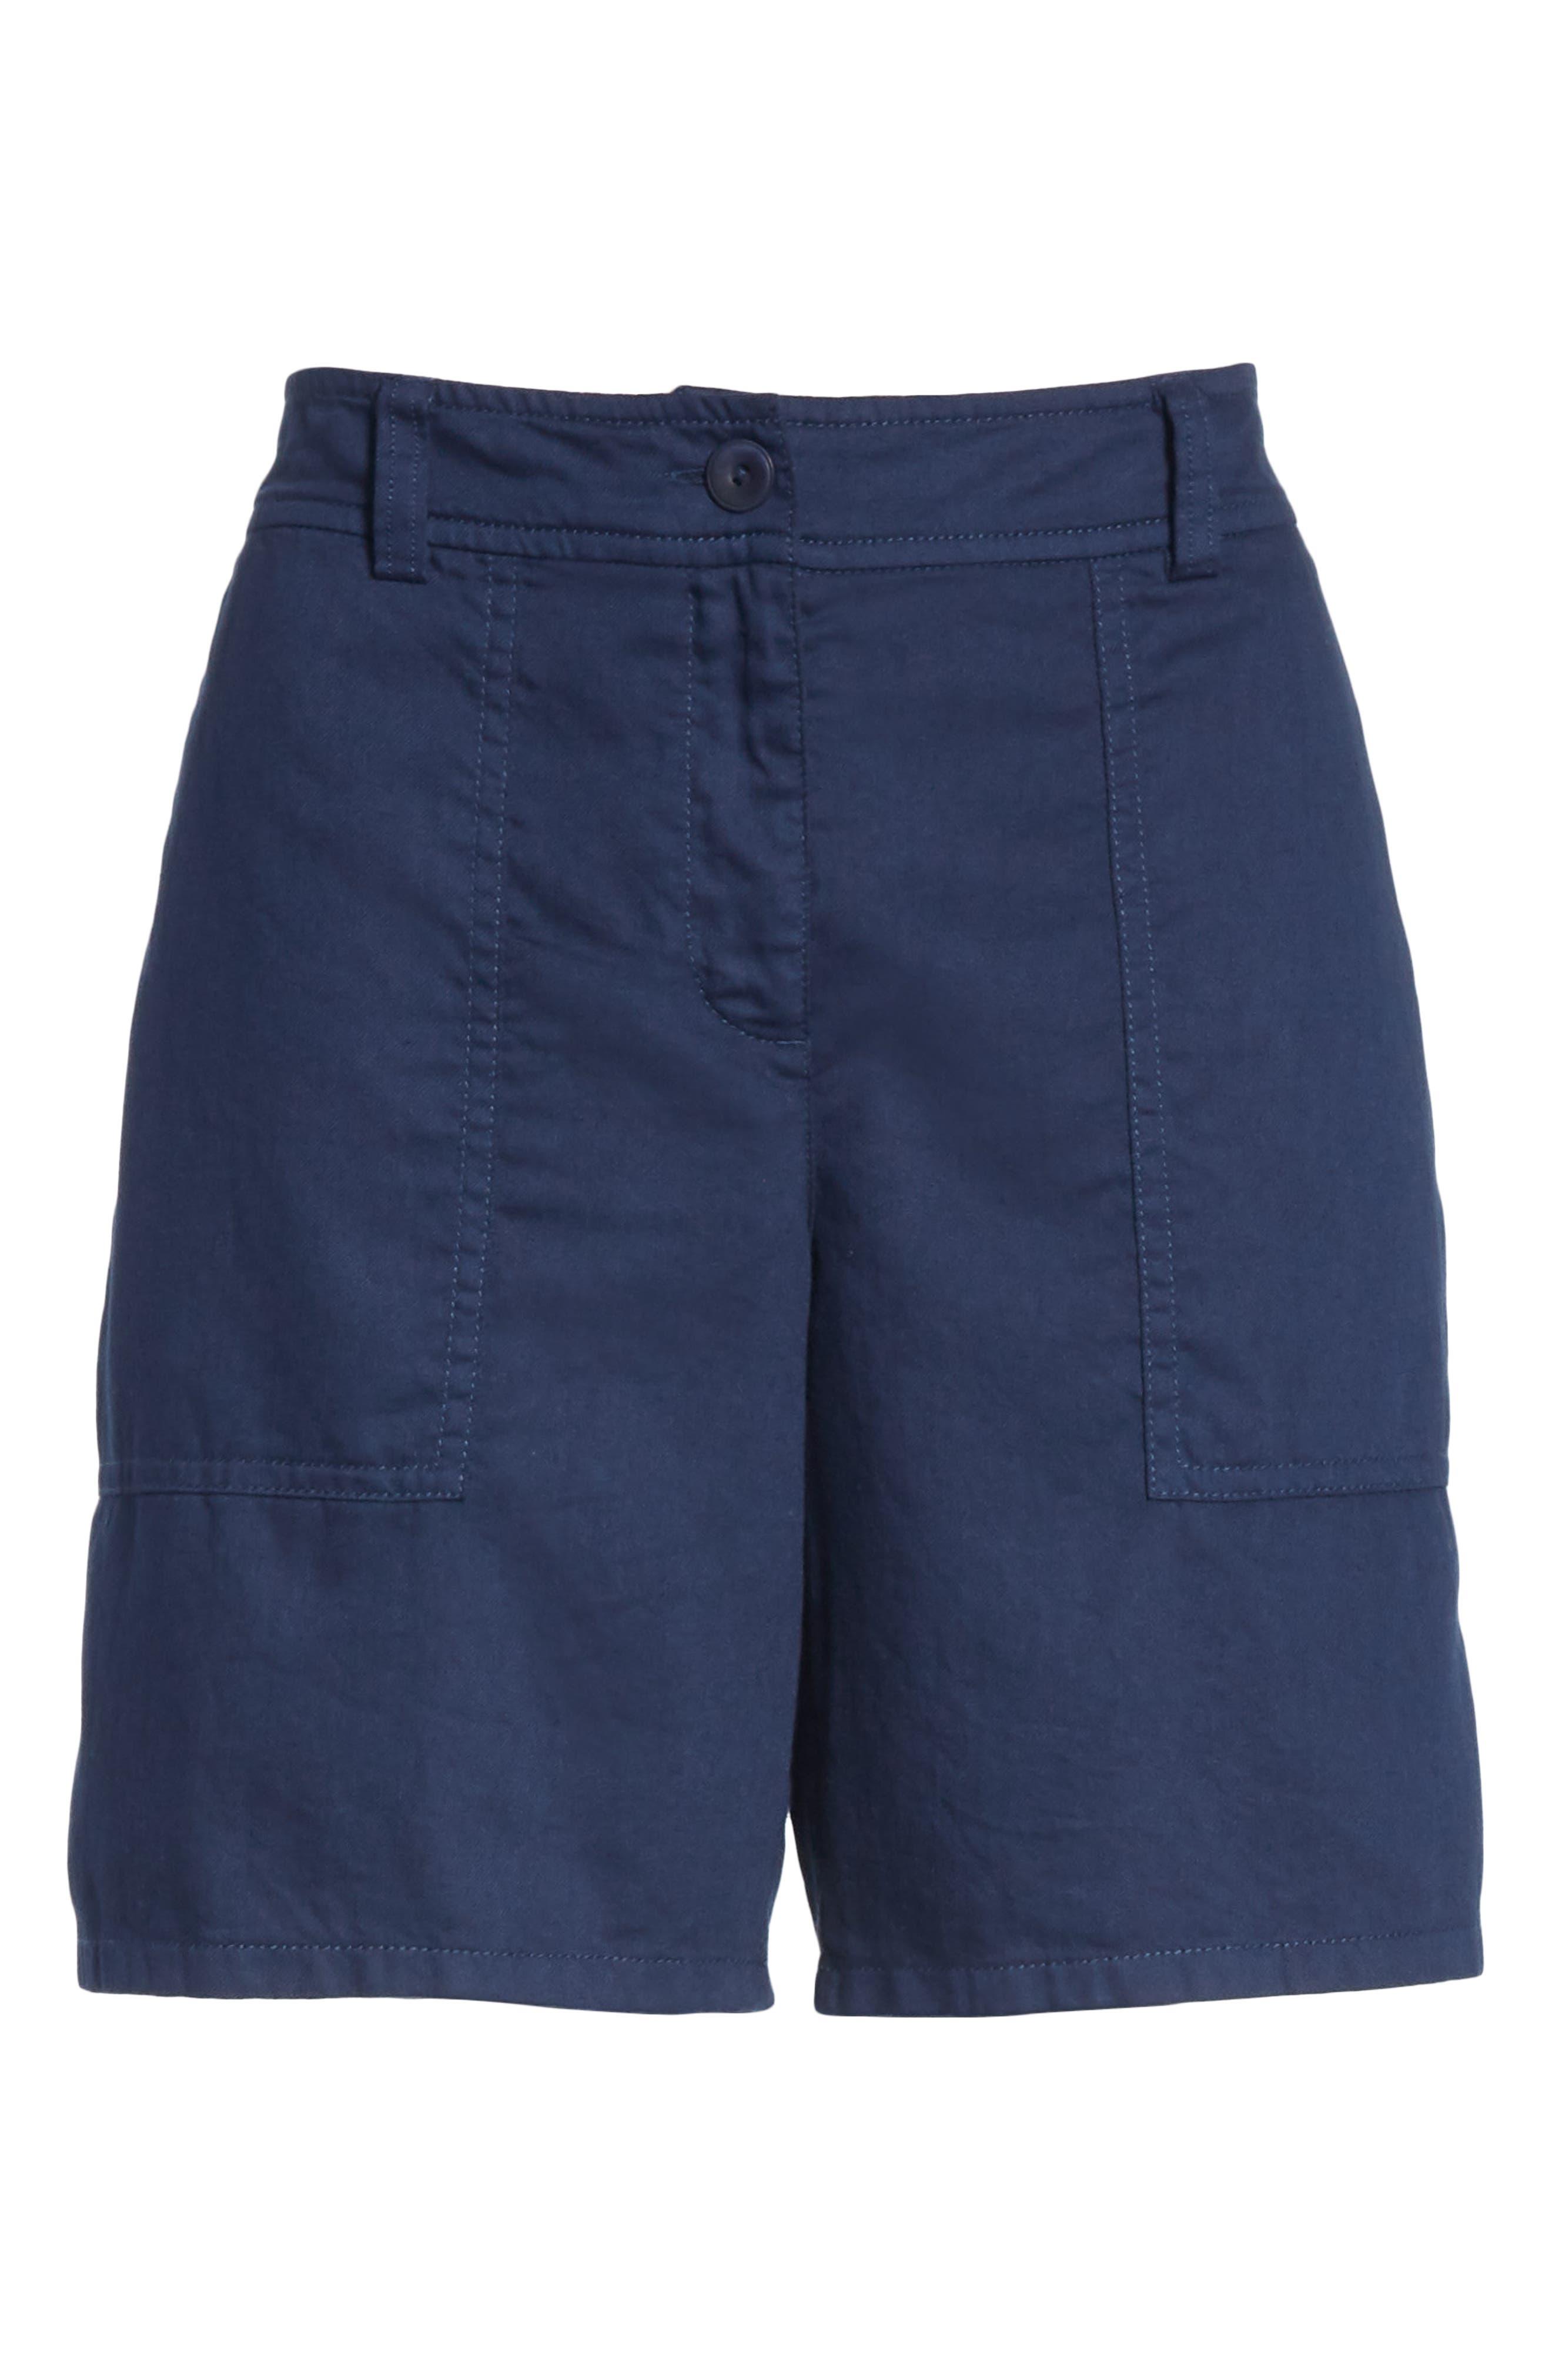 Organic Cotton Walking Shorts,                             Alternate thumbnail 6, color,                             INDIGO